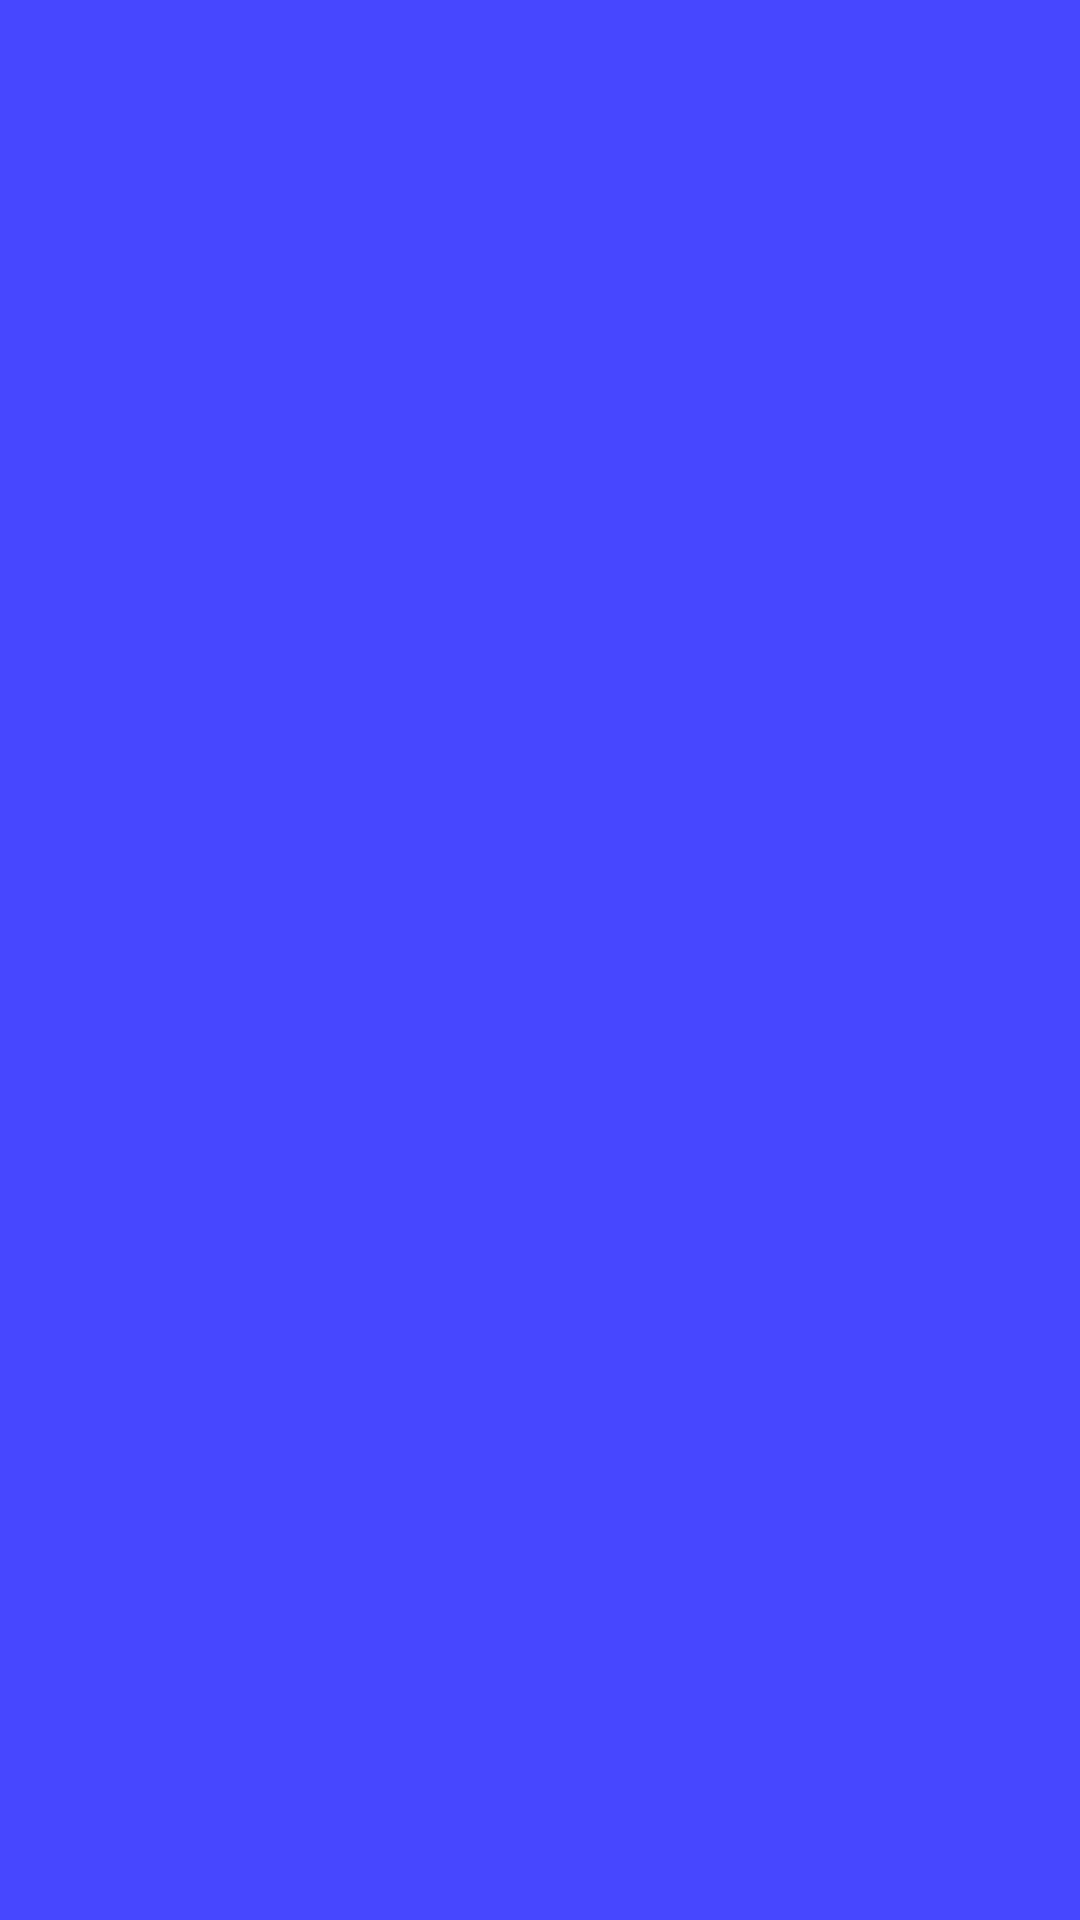 Plain blue iPhone 5 6 wallpaper iPod wallpaper 1080x1920